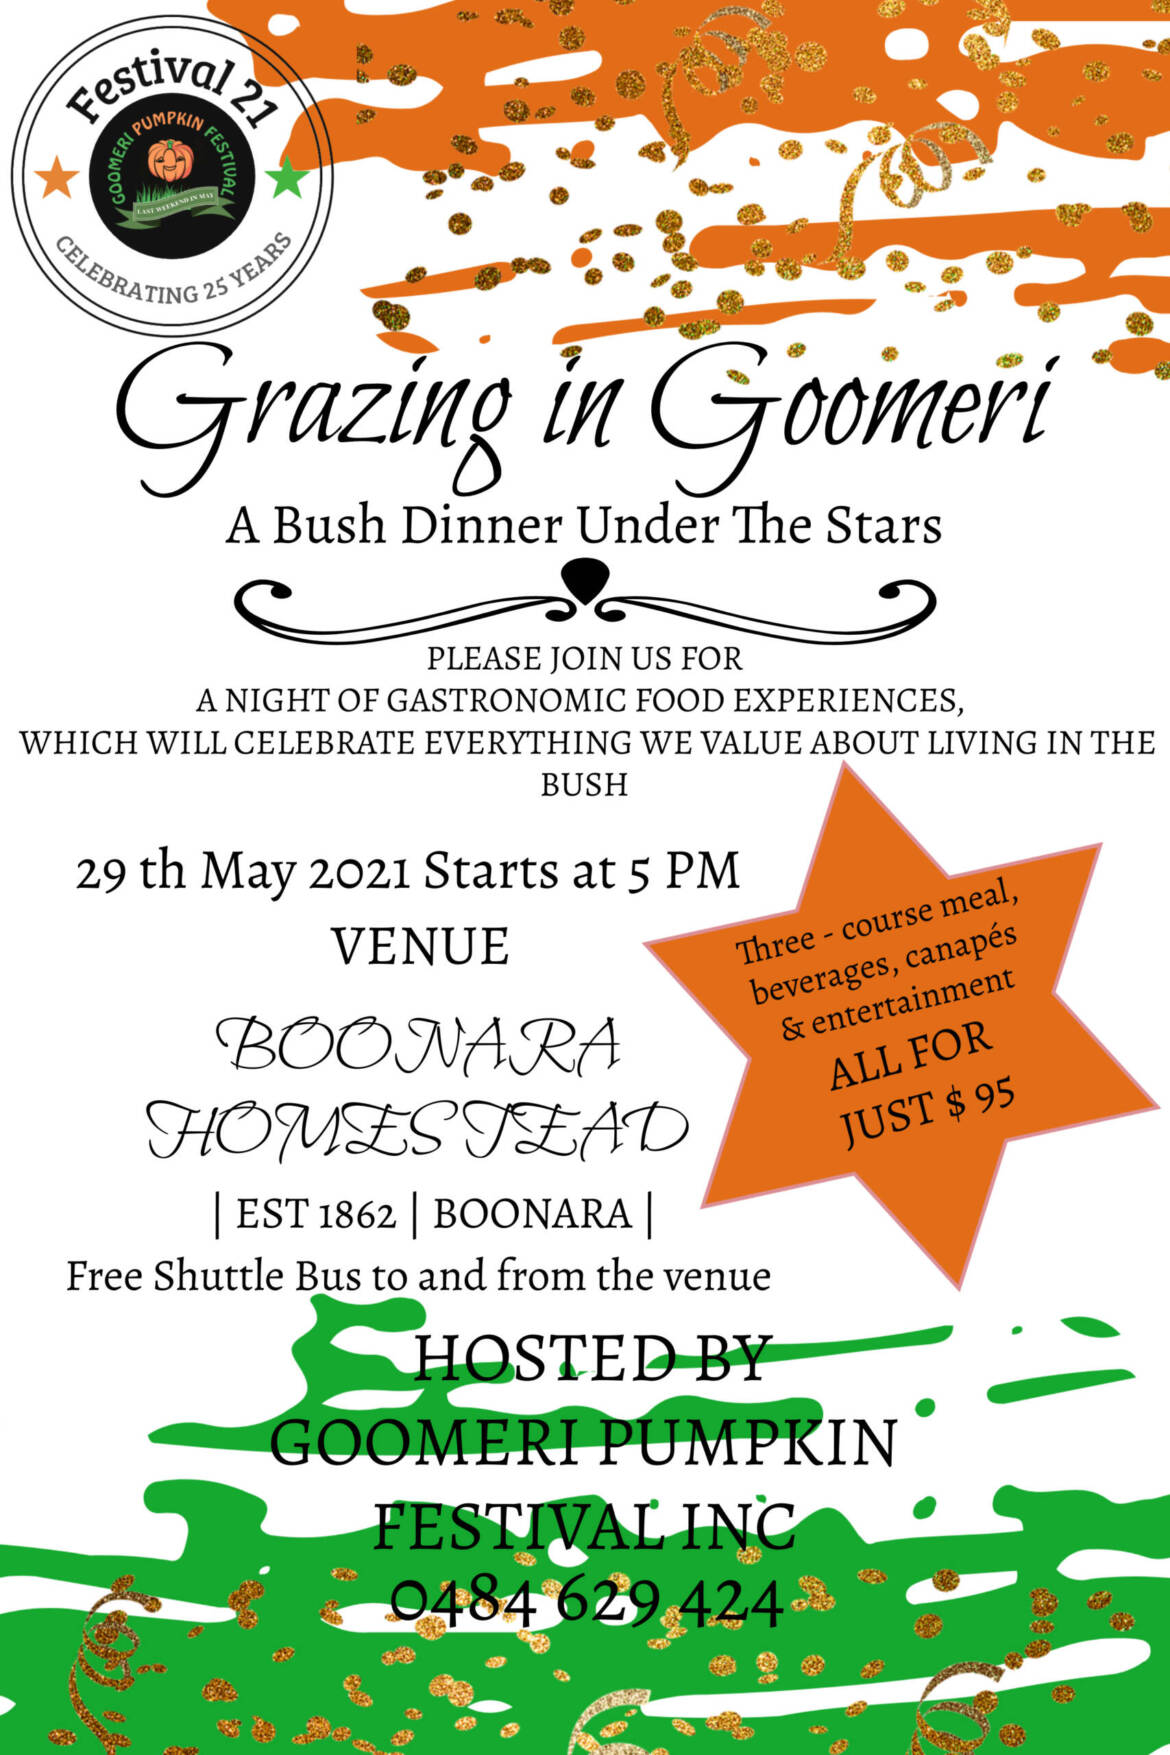 Goomeri-grazing-scaled.jpg